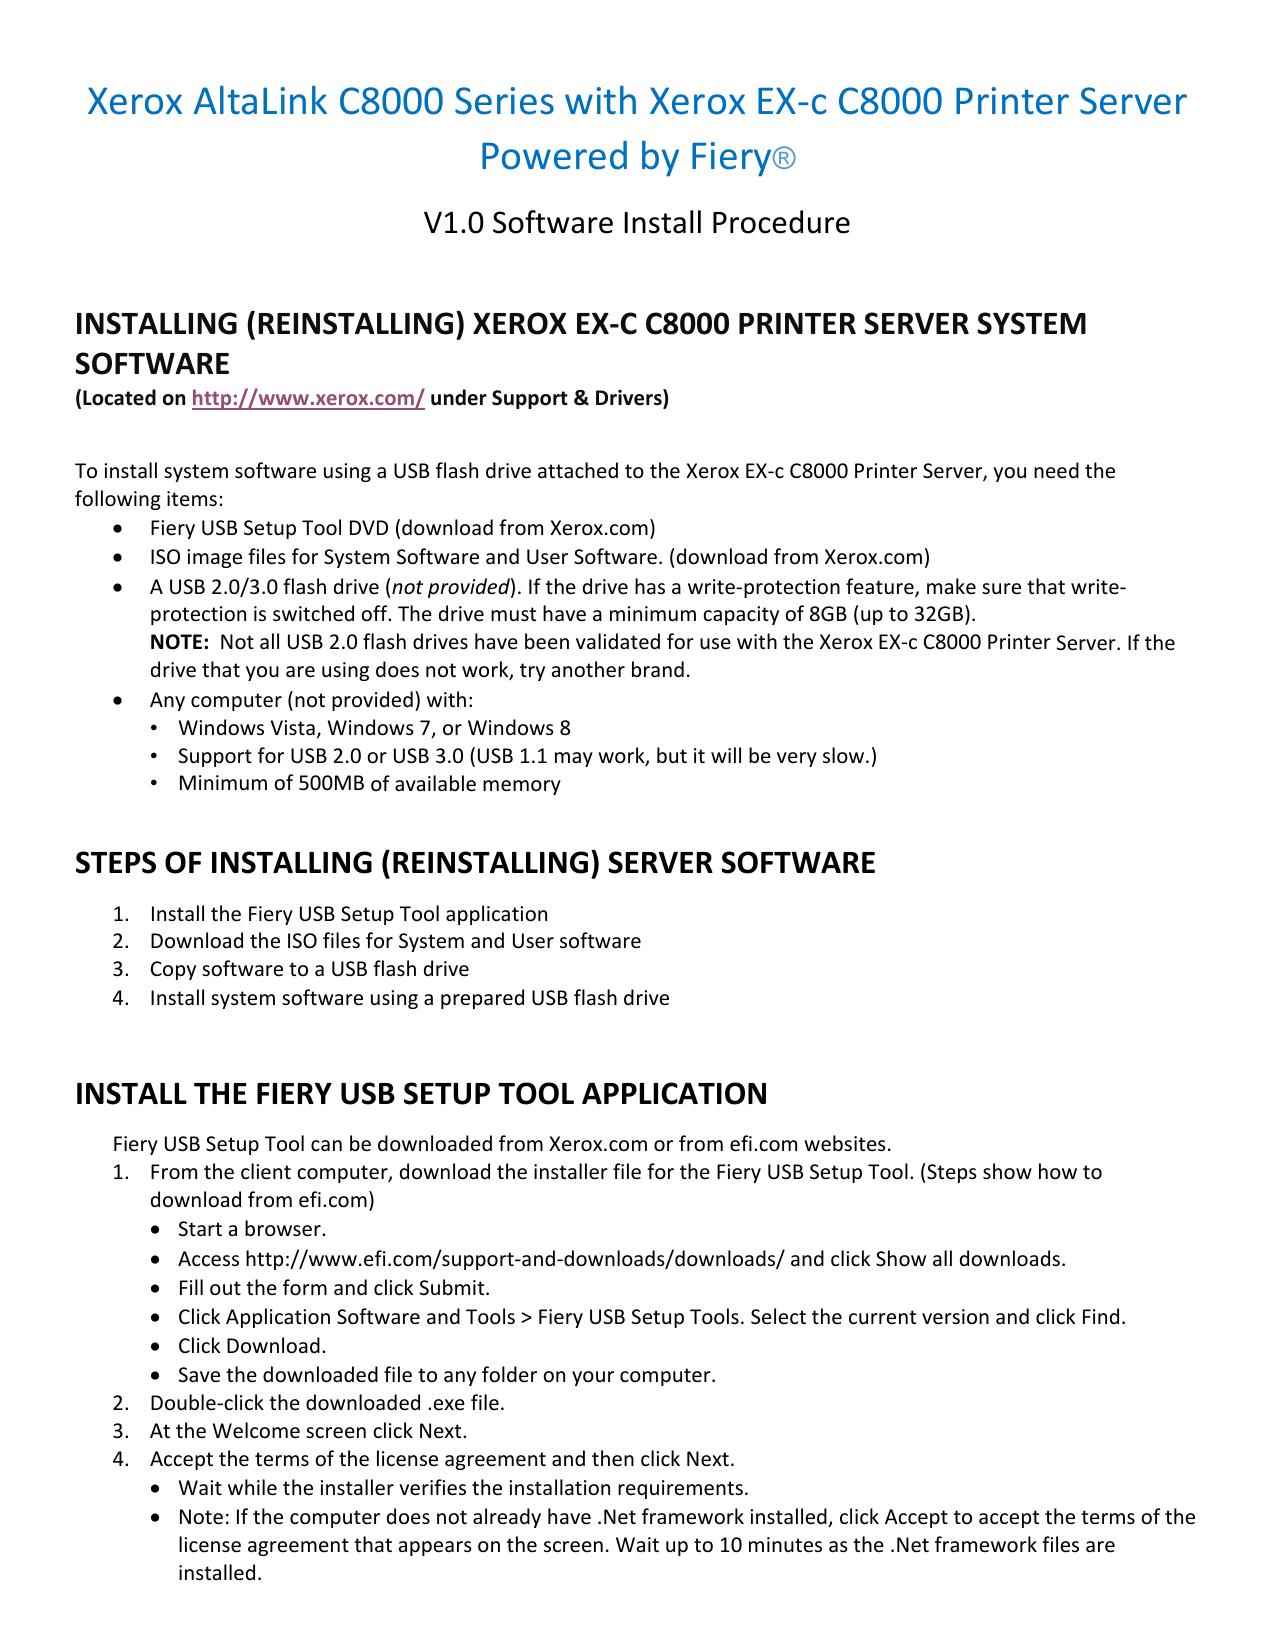 Xerox AltaLink C8000 Series with Xerox EX-c | manualzz com